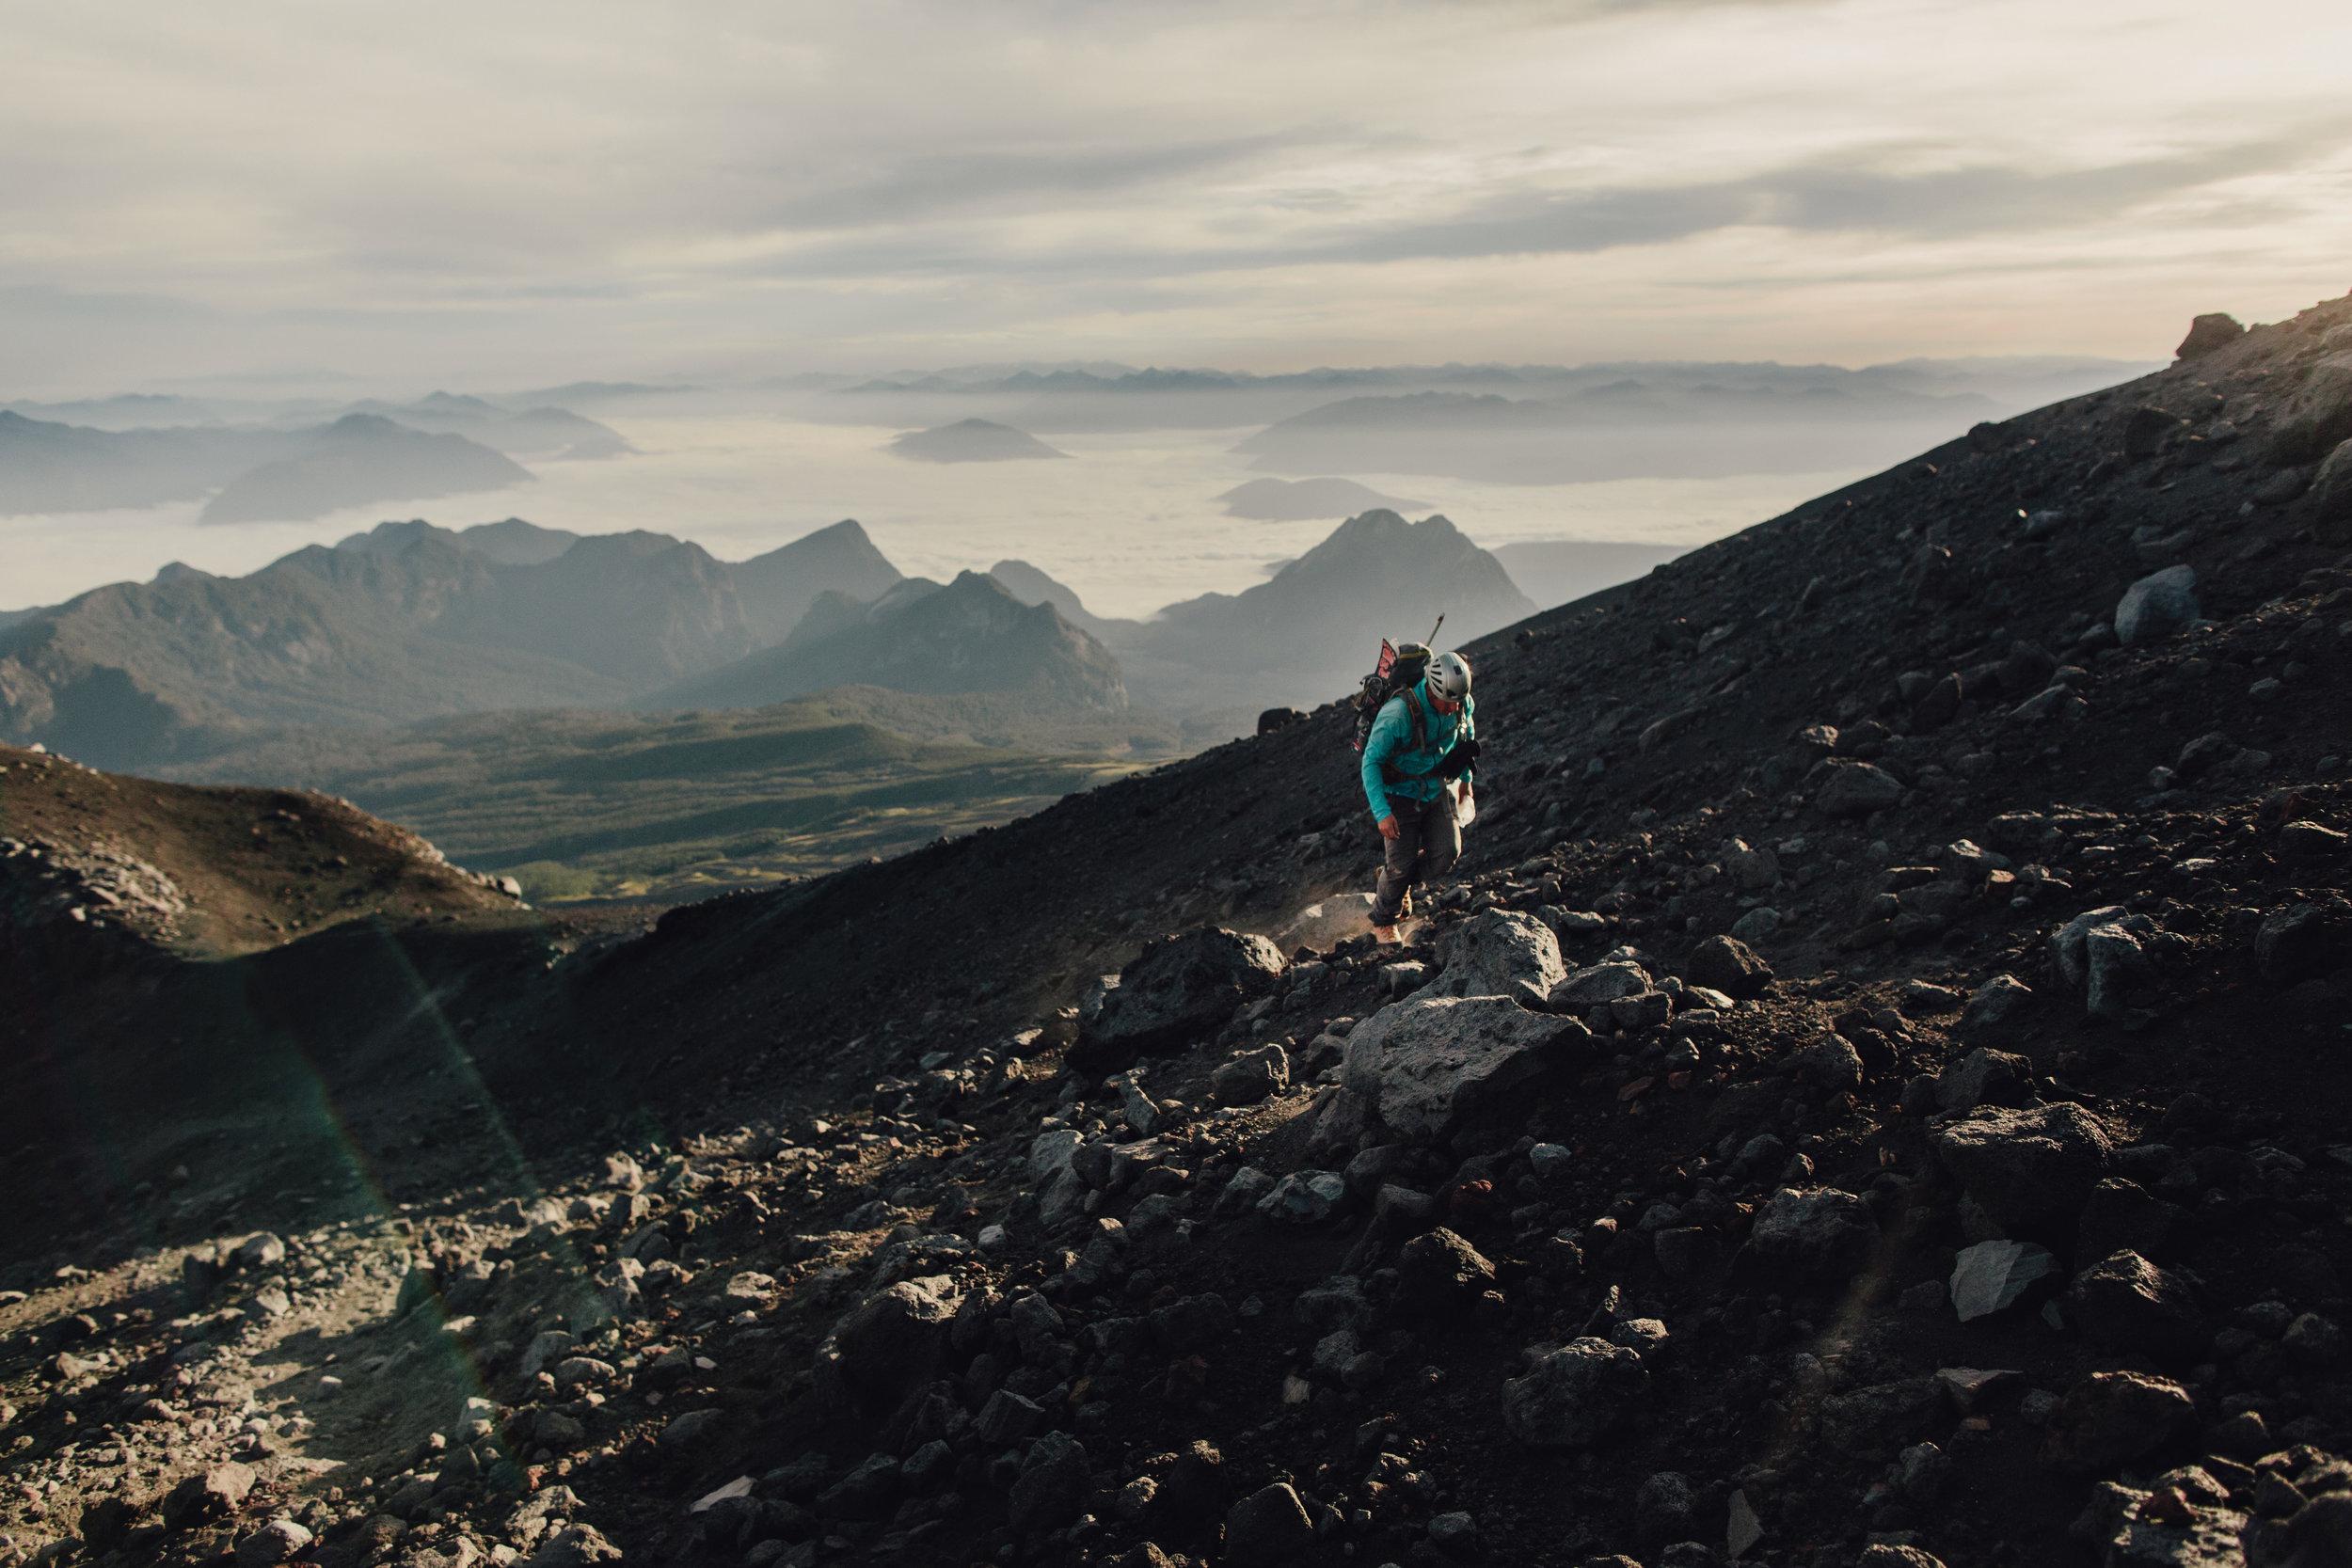 villarrica-volcano-trek-pucon-chile-0002.jpg